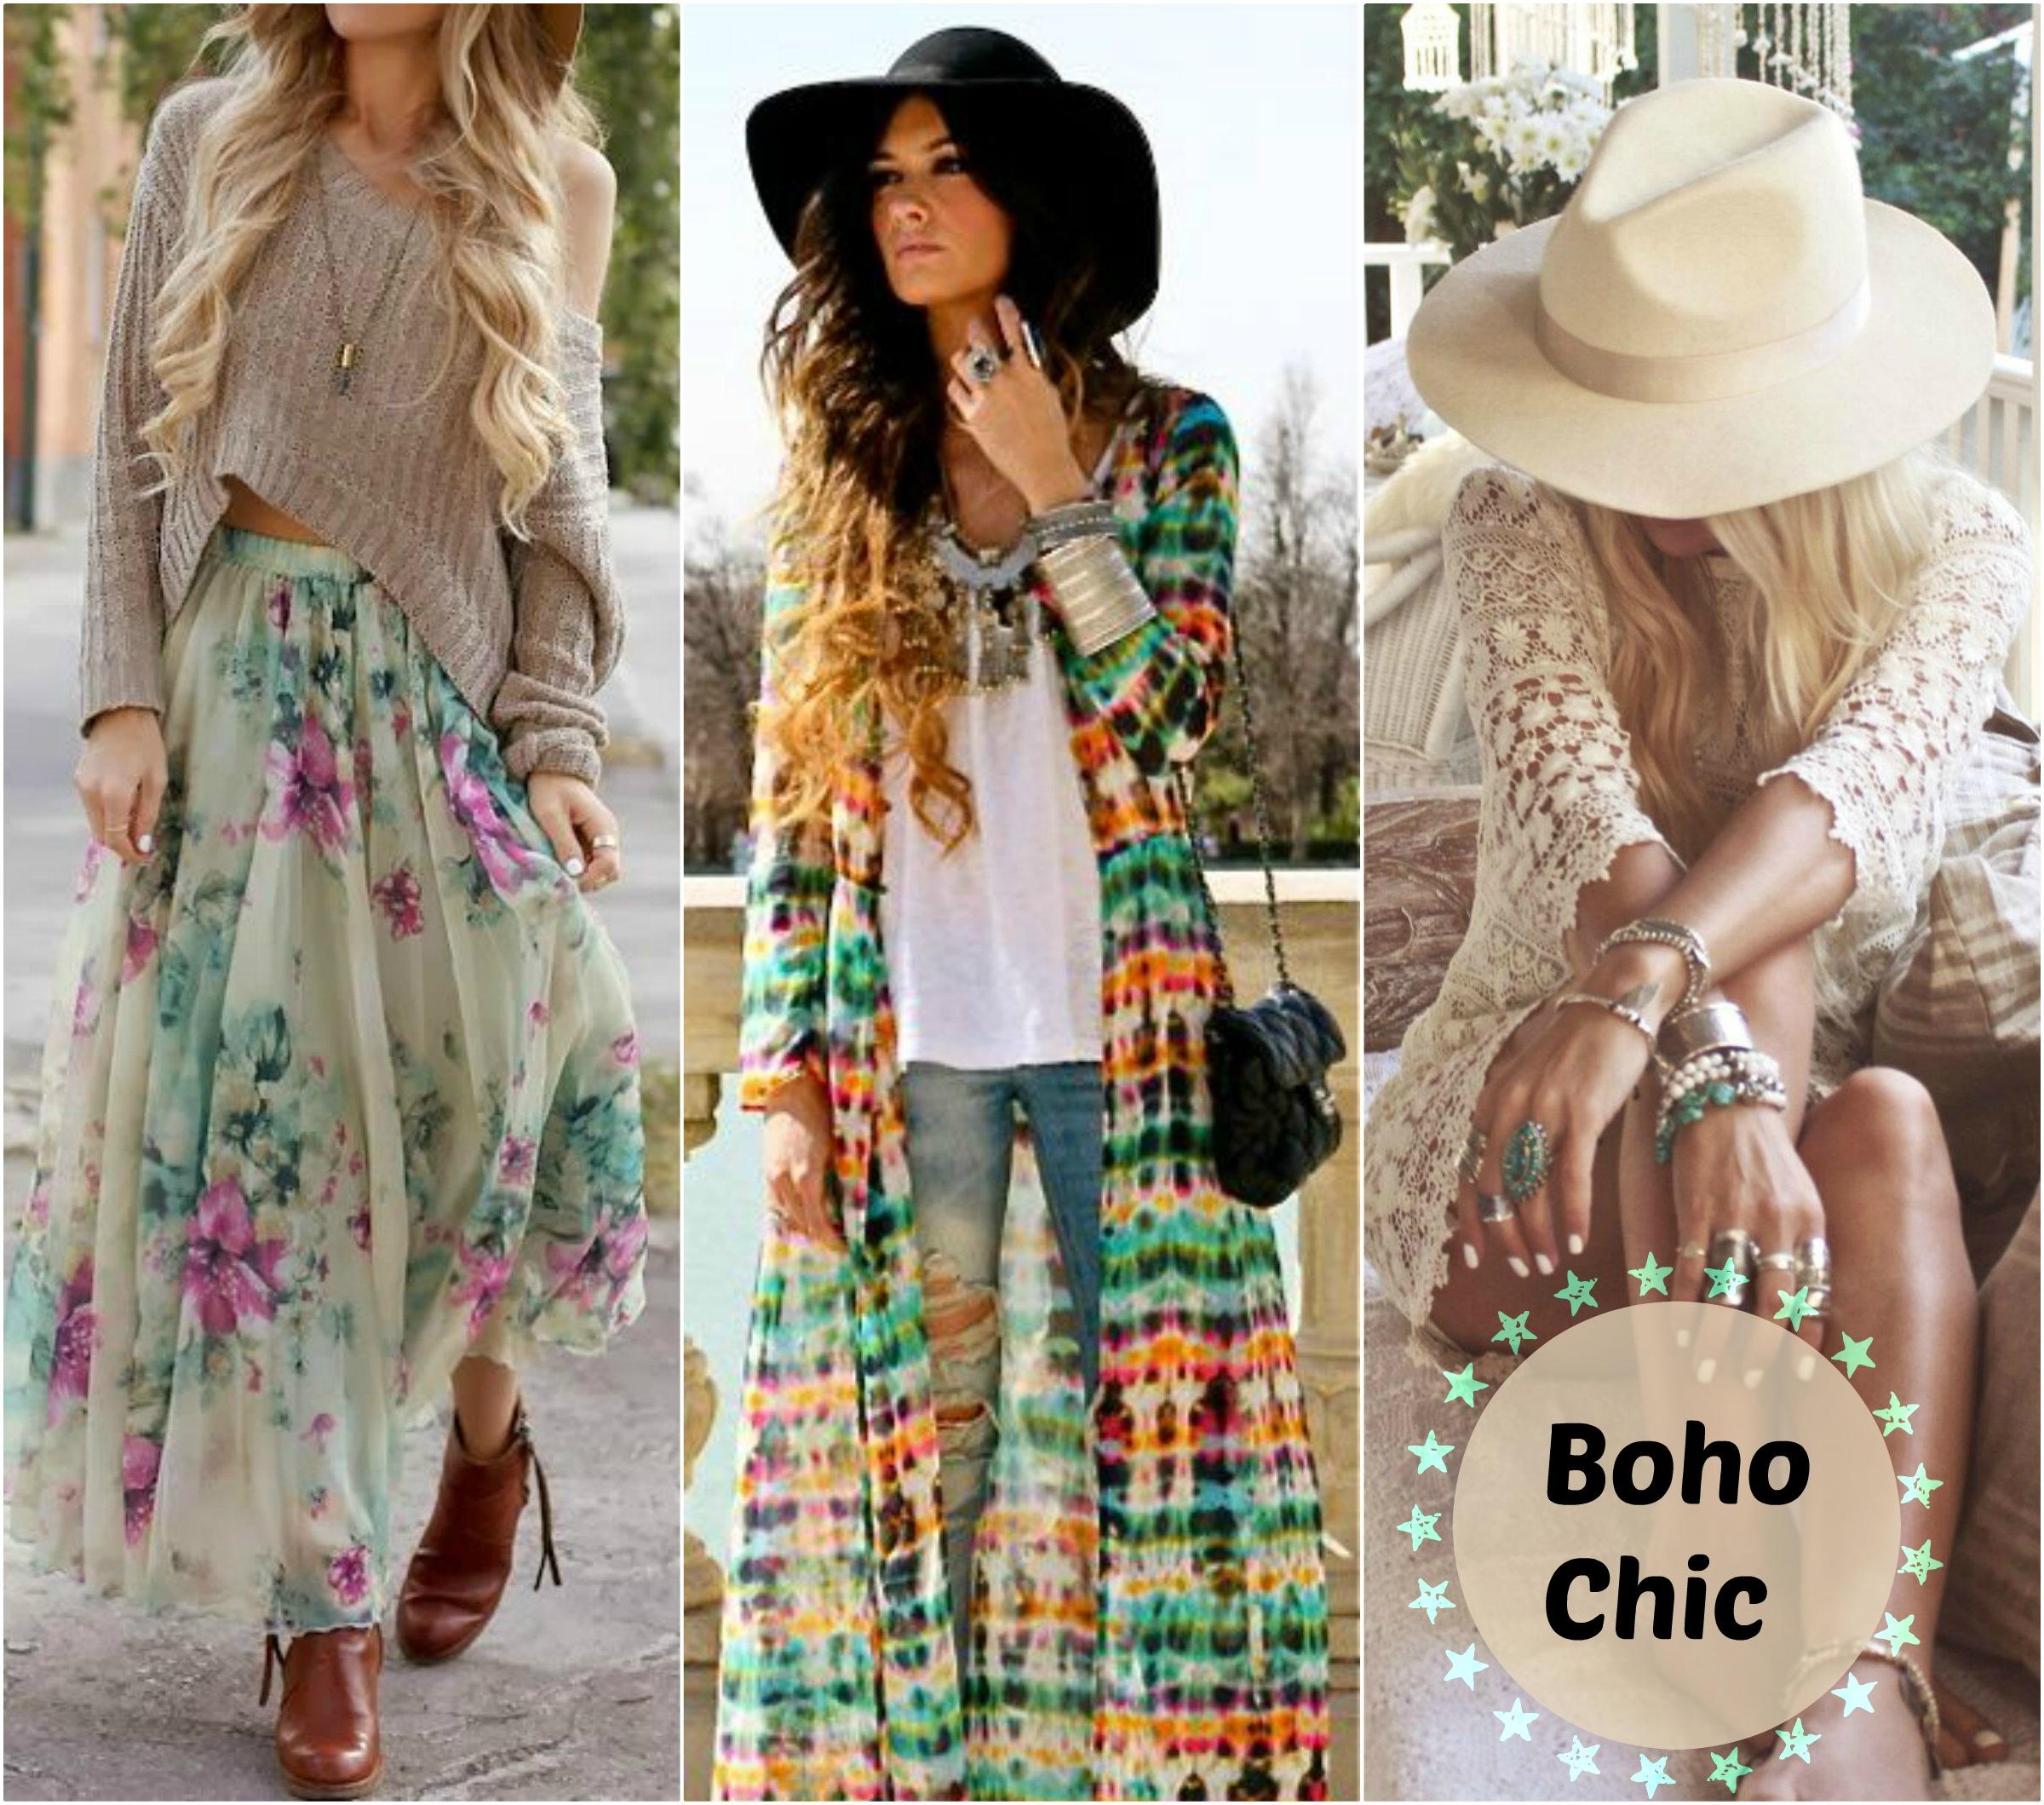 Patris boutique sua boutique feminina - Estilo boho chic ...